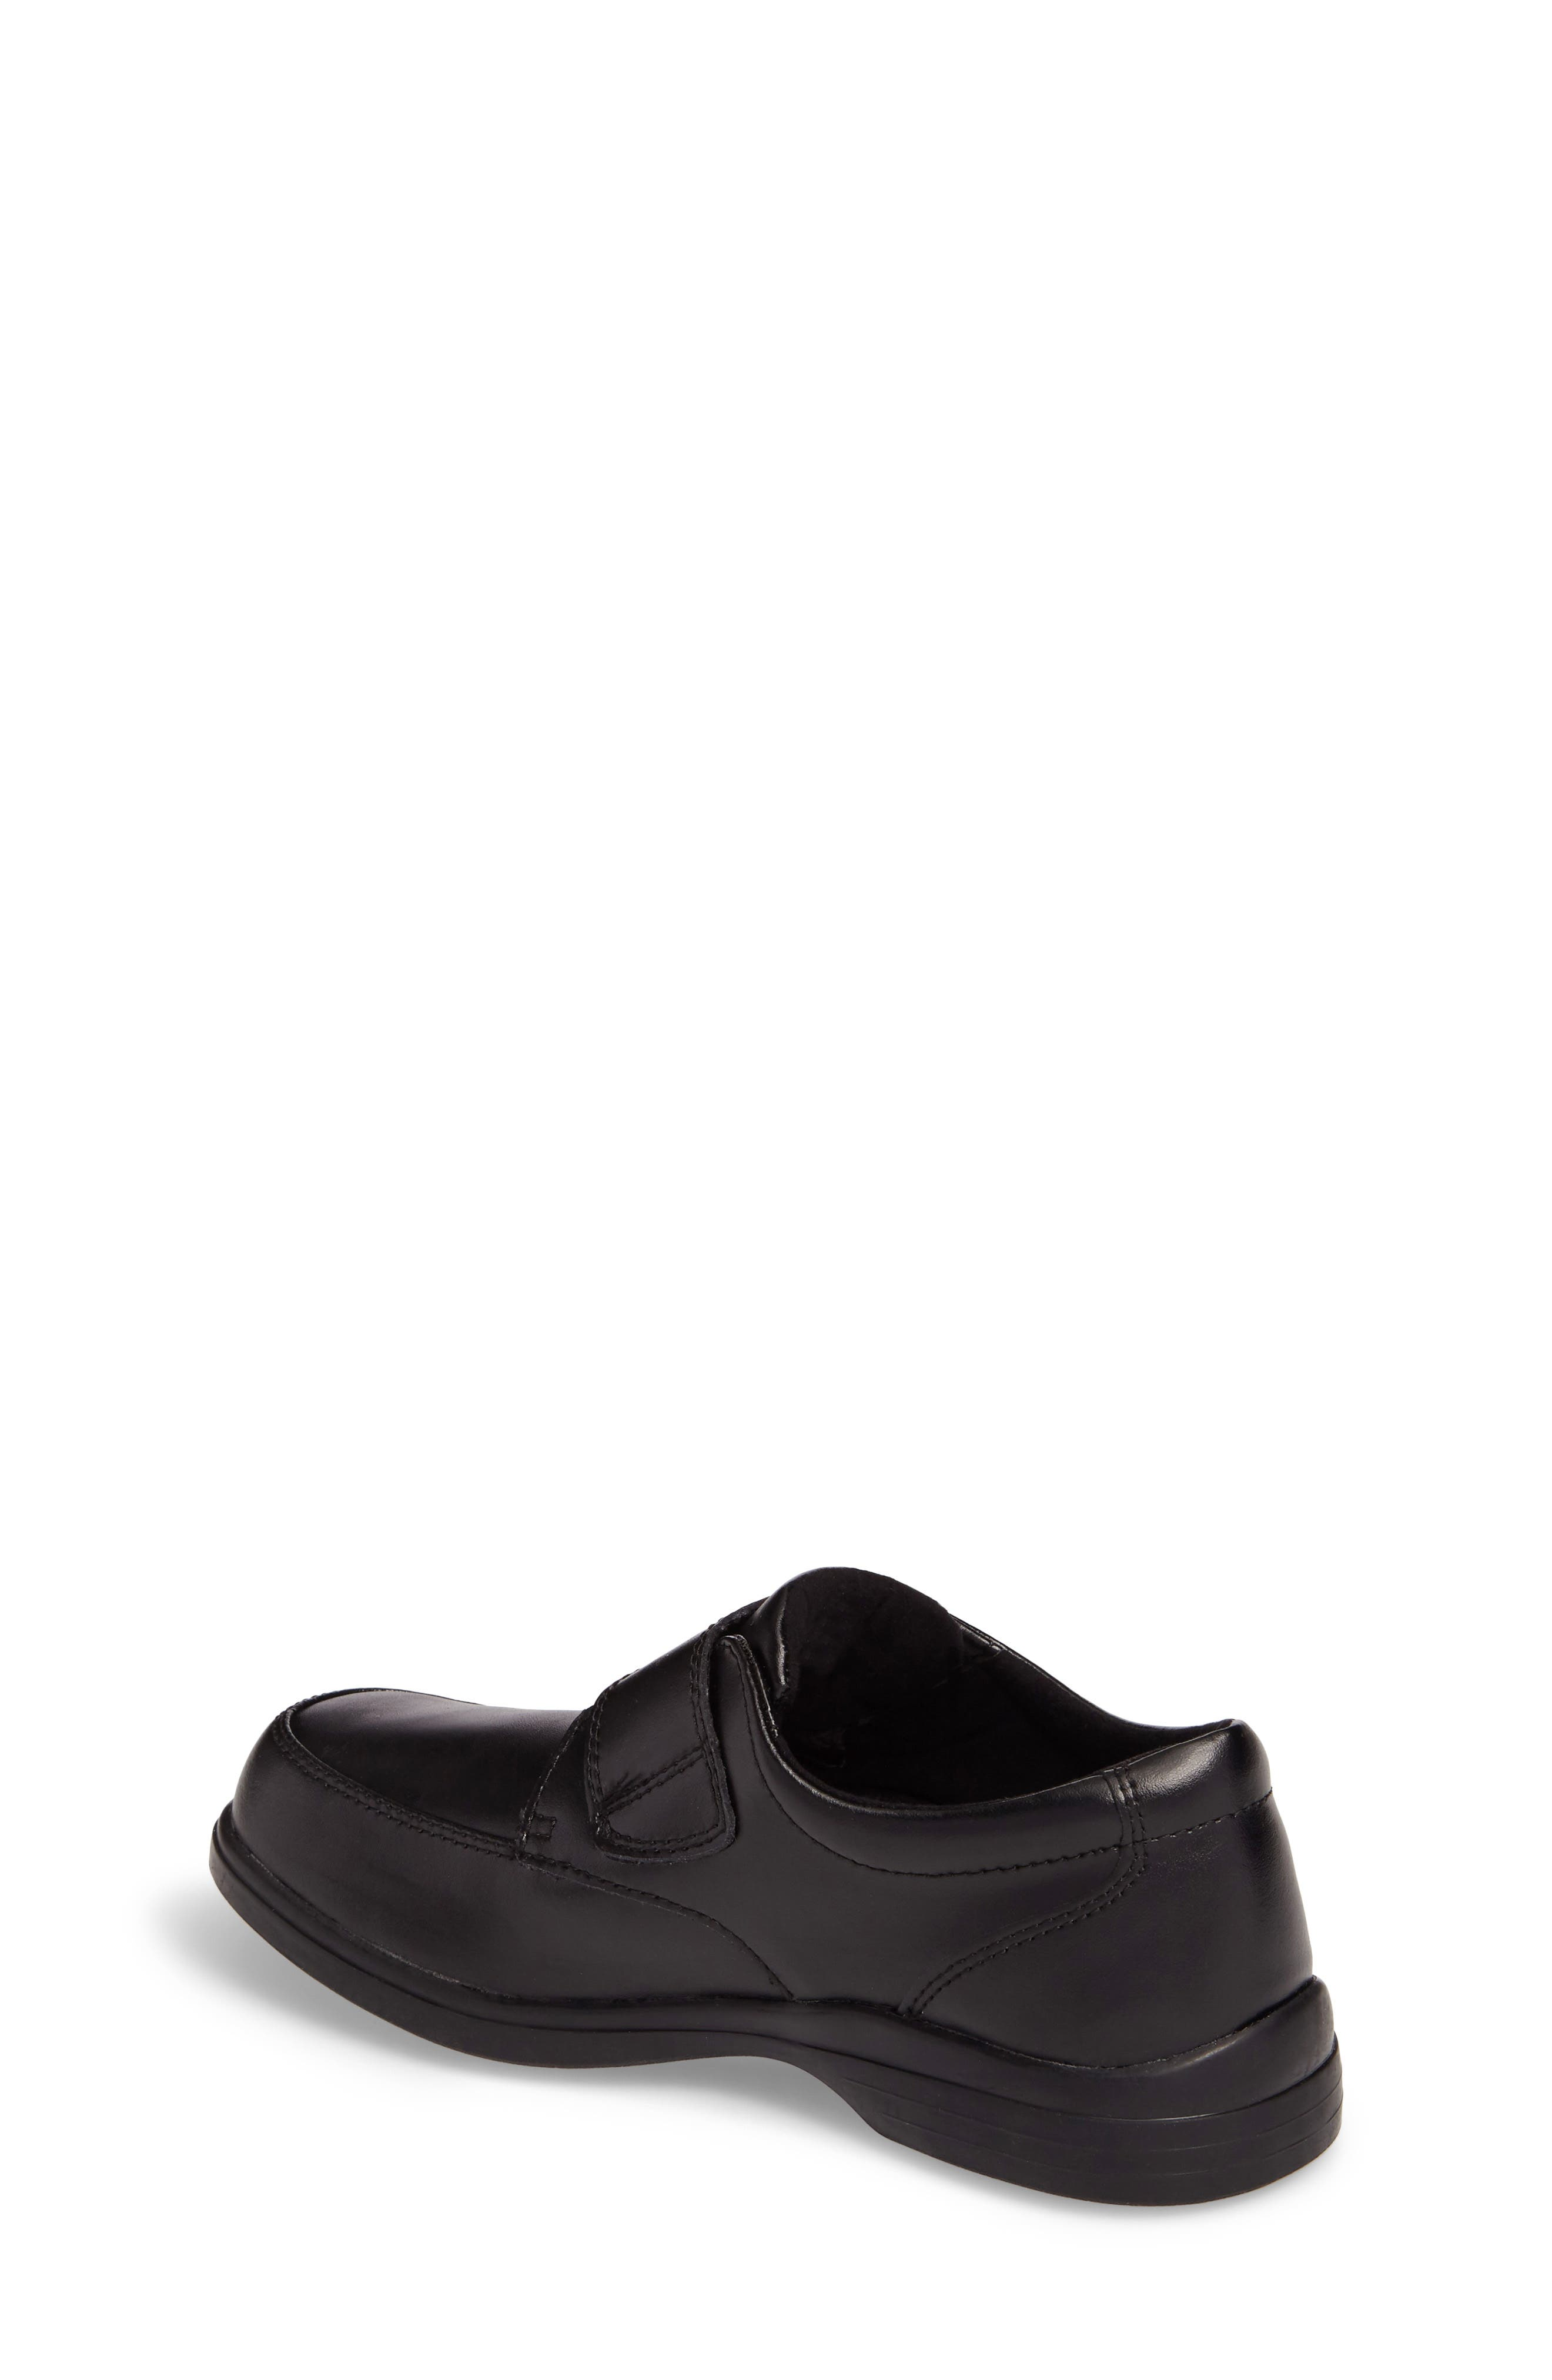 Hush Puppies Gavin Front Strap Dress Shoe,                             Alternate thumbnail 2, color,                             Black Leather